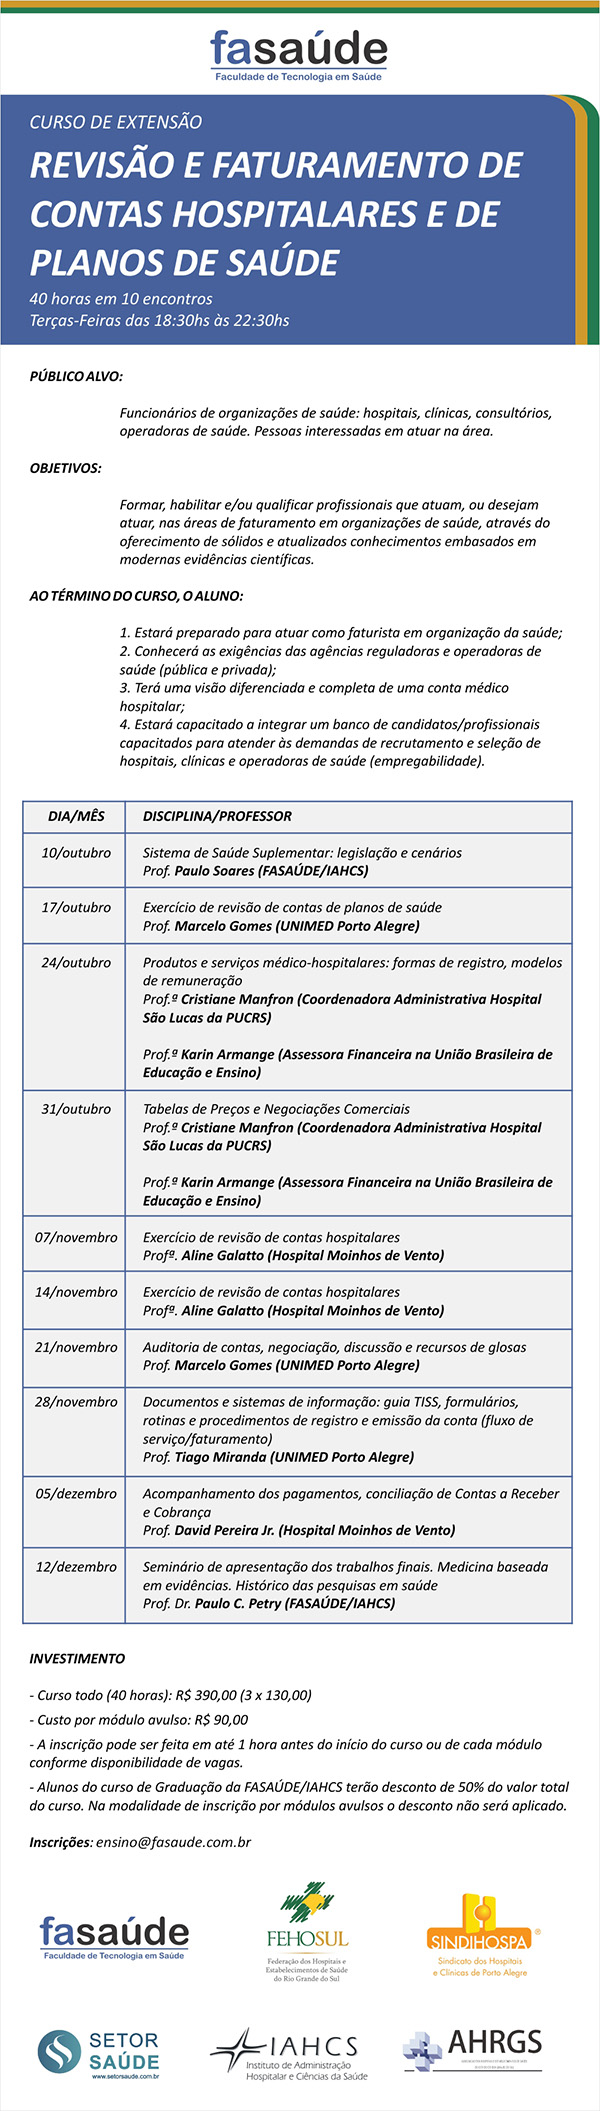 10_10_Curso_Extensao_Revisao_Faturamento_Contas_Medico_Hospitalares_Planos_Saude_Fasaude copy